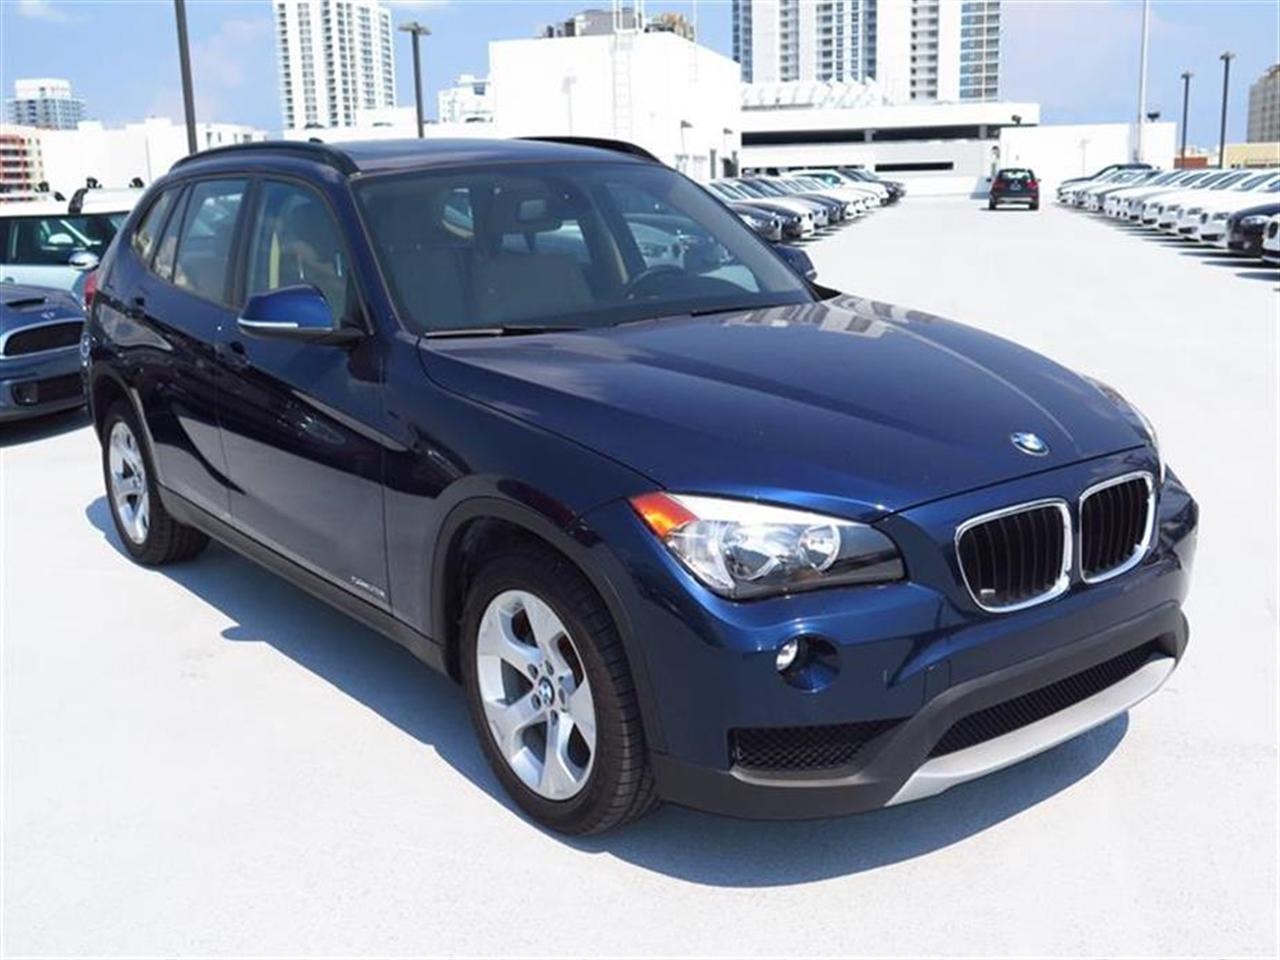 2014 BMW X1 RWD 4dr sDrive28i 10757 miles VIN WBAVM1C55EVW49629